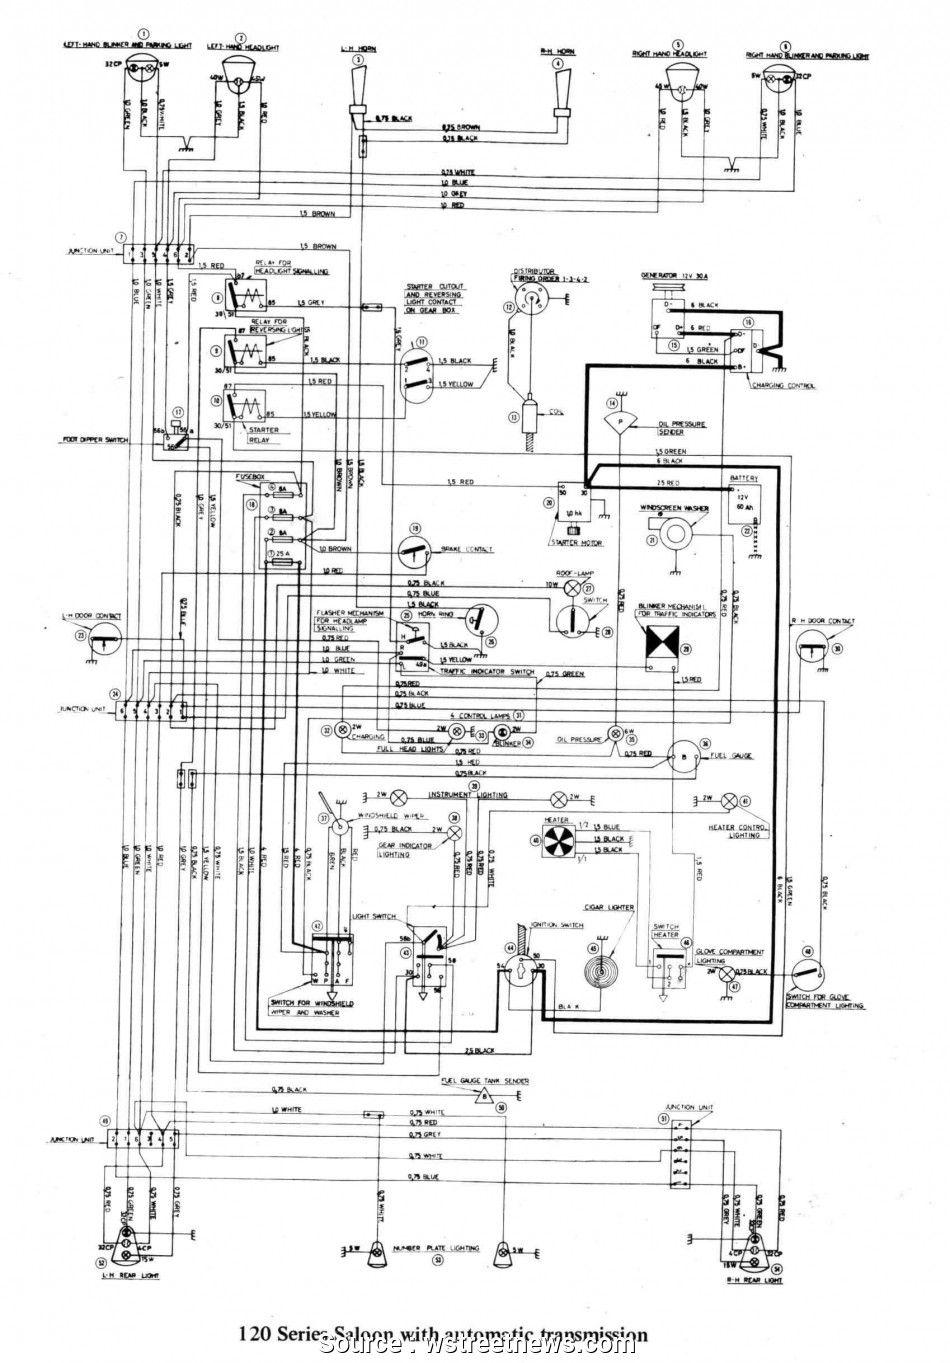 Subaru Forester Wiring Diagram Heater